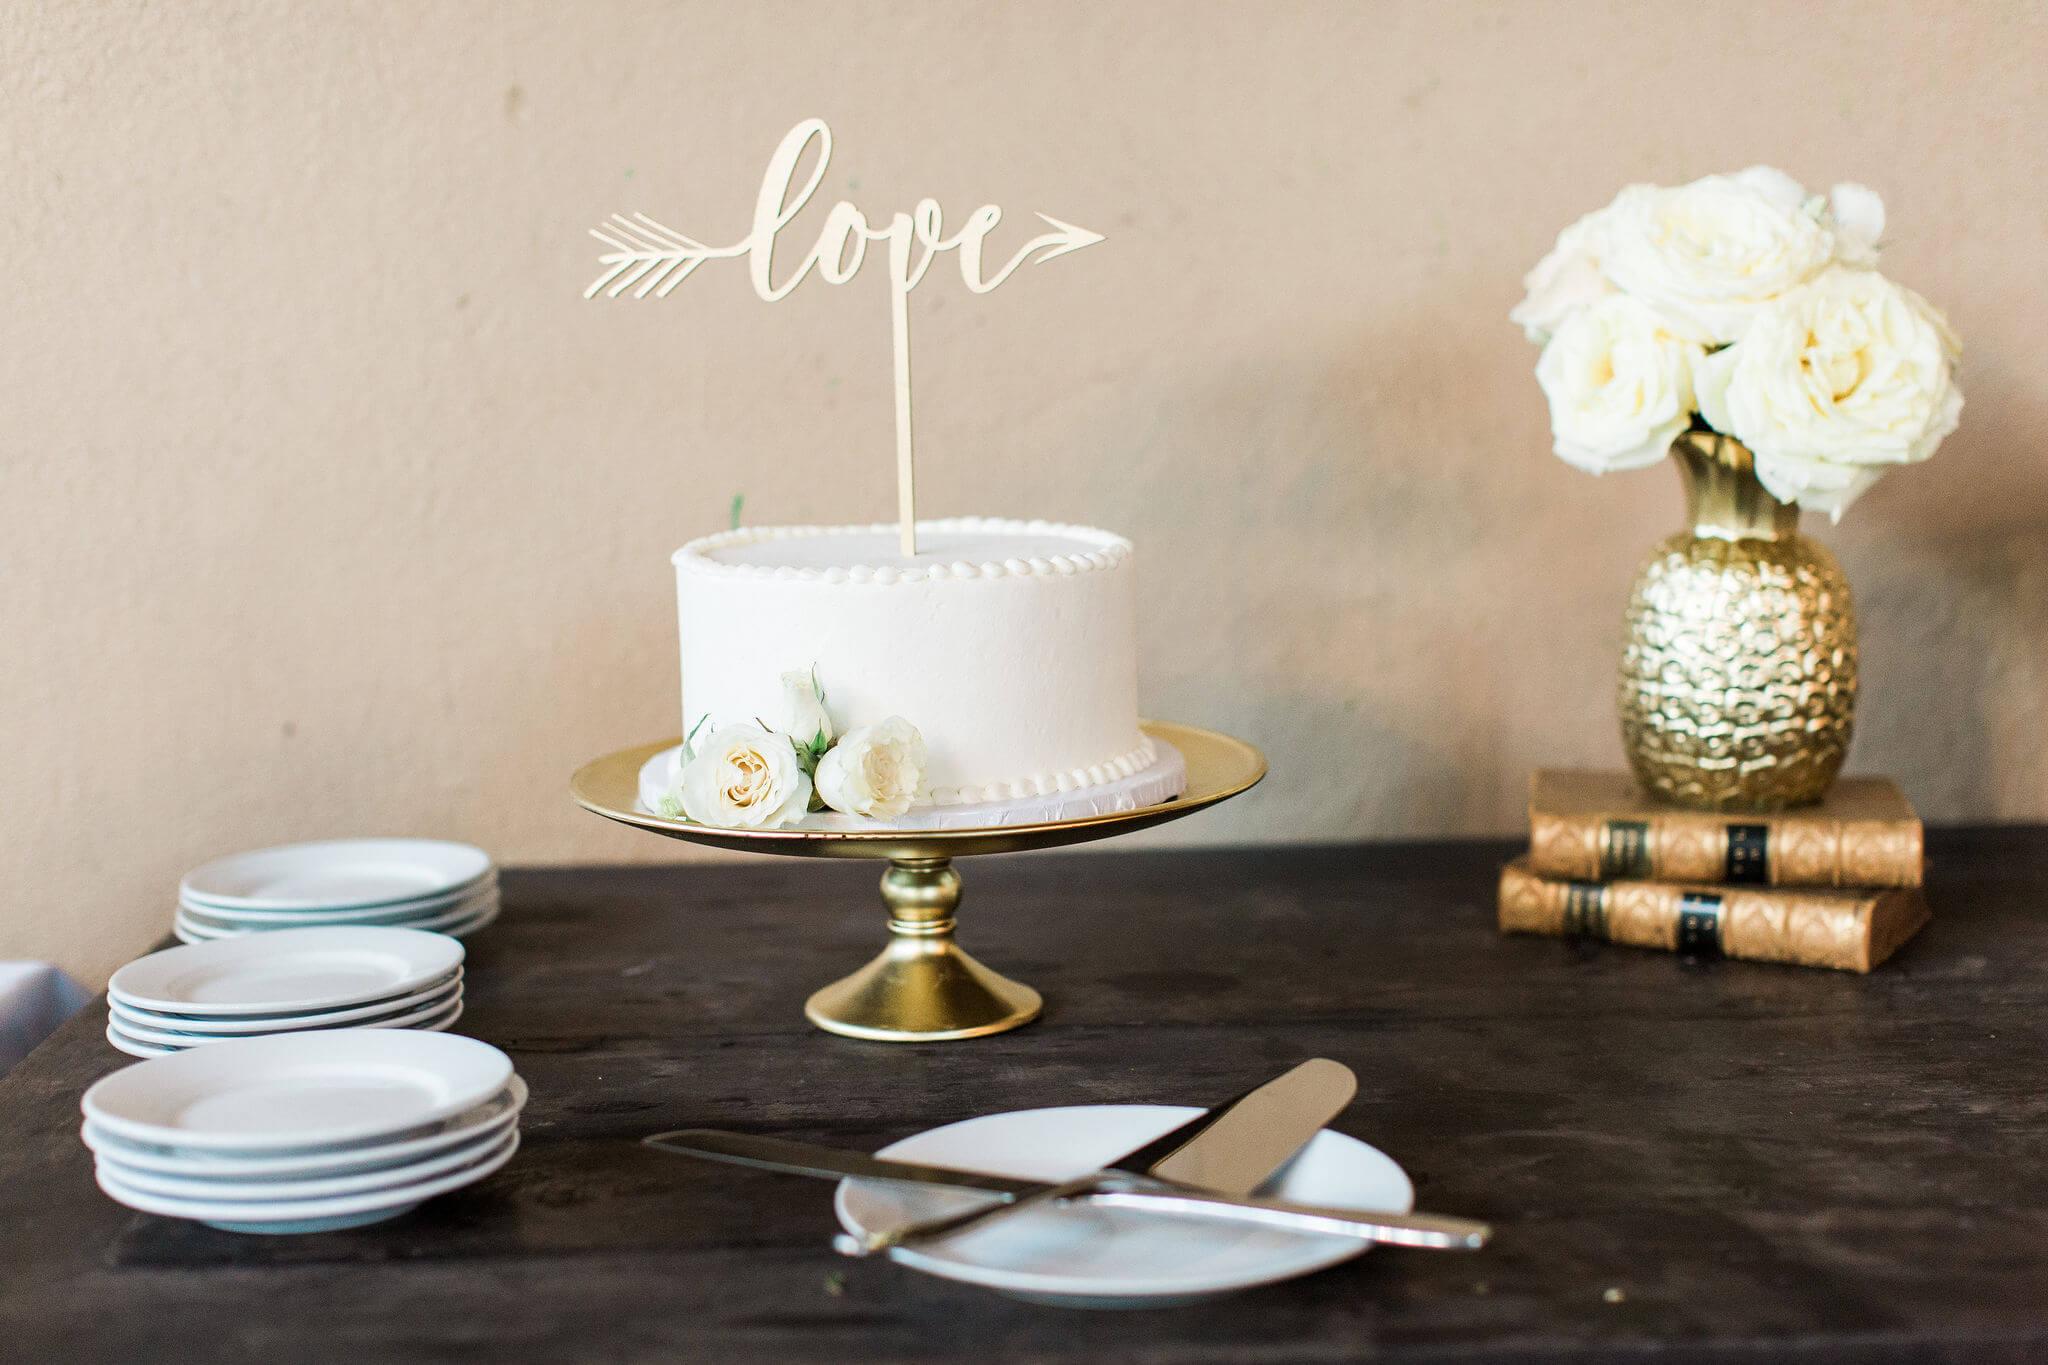 apt-b-photography-savannah-wedding-photographer-savannah-wedding-savannah-elopement-intimate-wedding-photographer-104.JPG